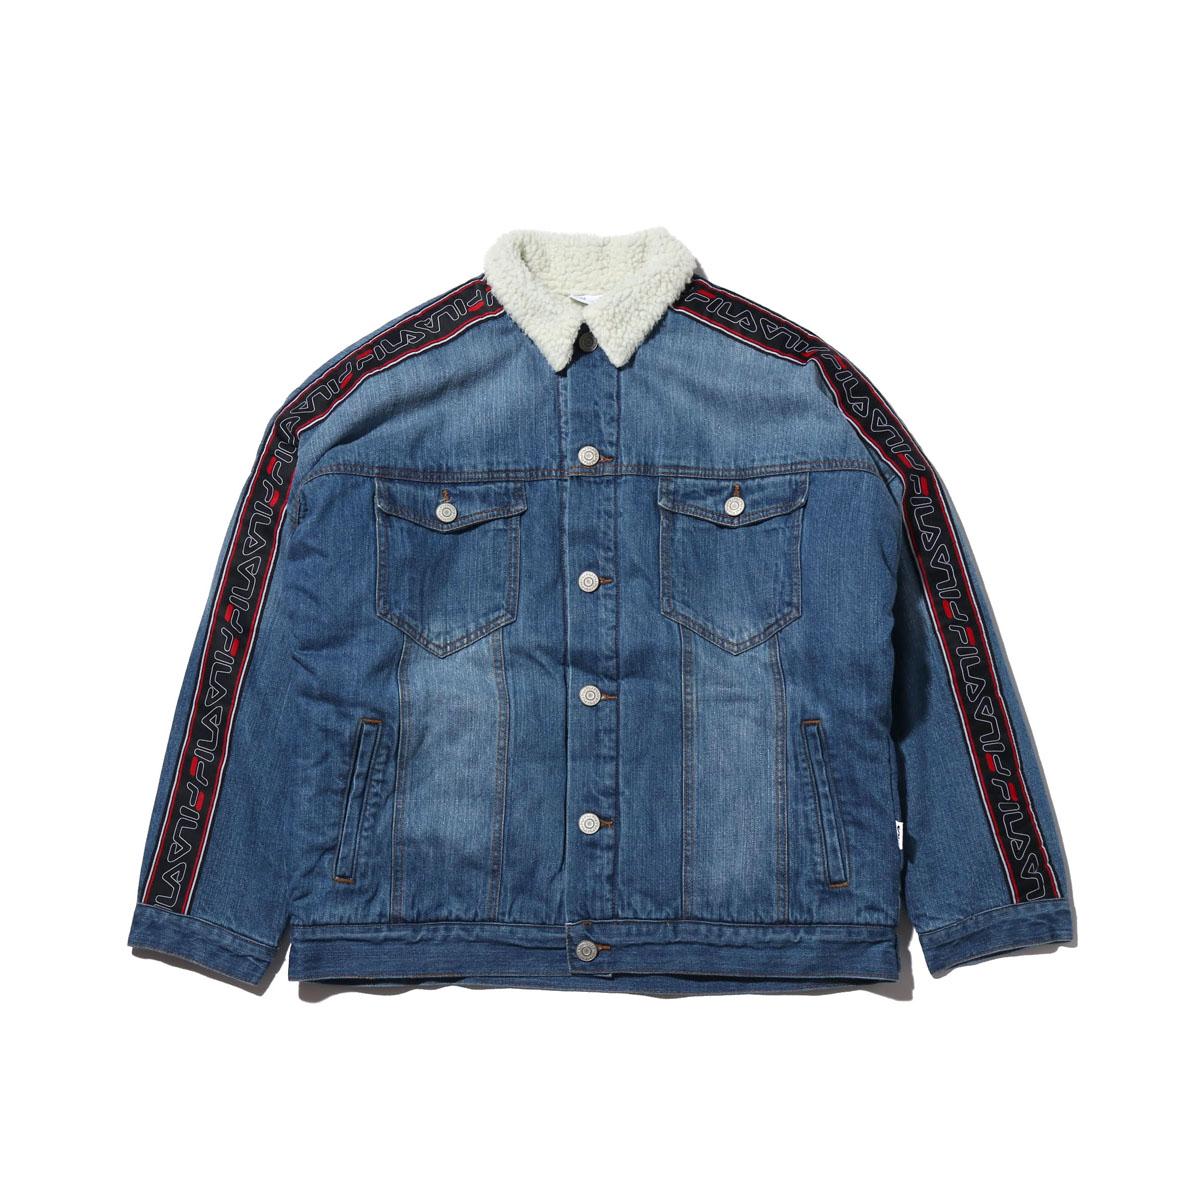 FILA Denim boa Jacket (フィラ デニム ボア ジャケット)NAVY【メンズ ジャケット】18FW-I